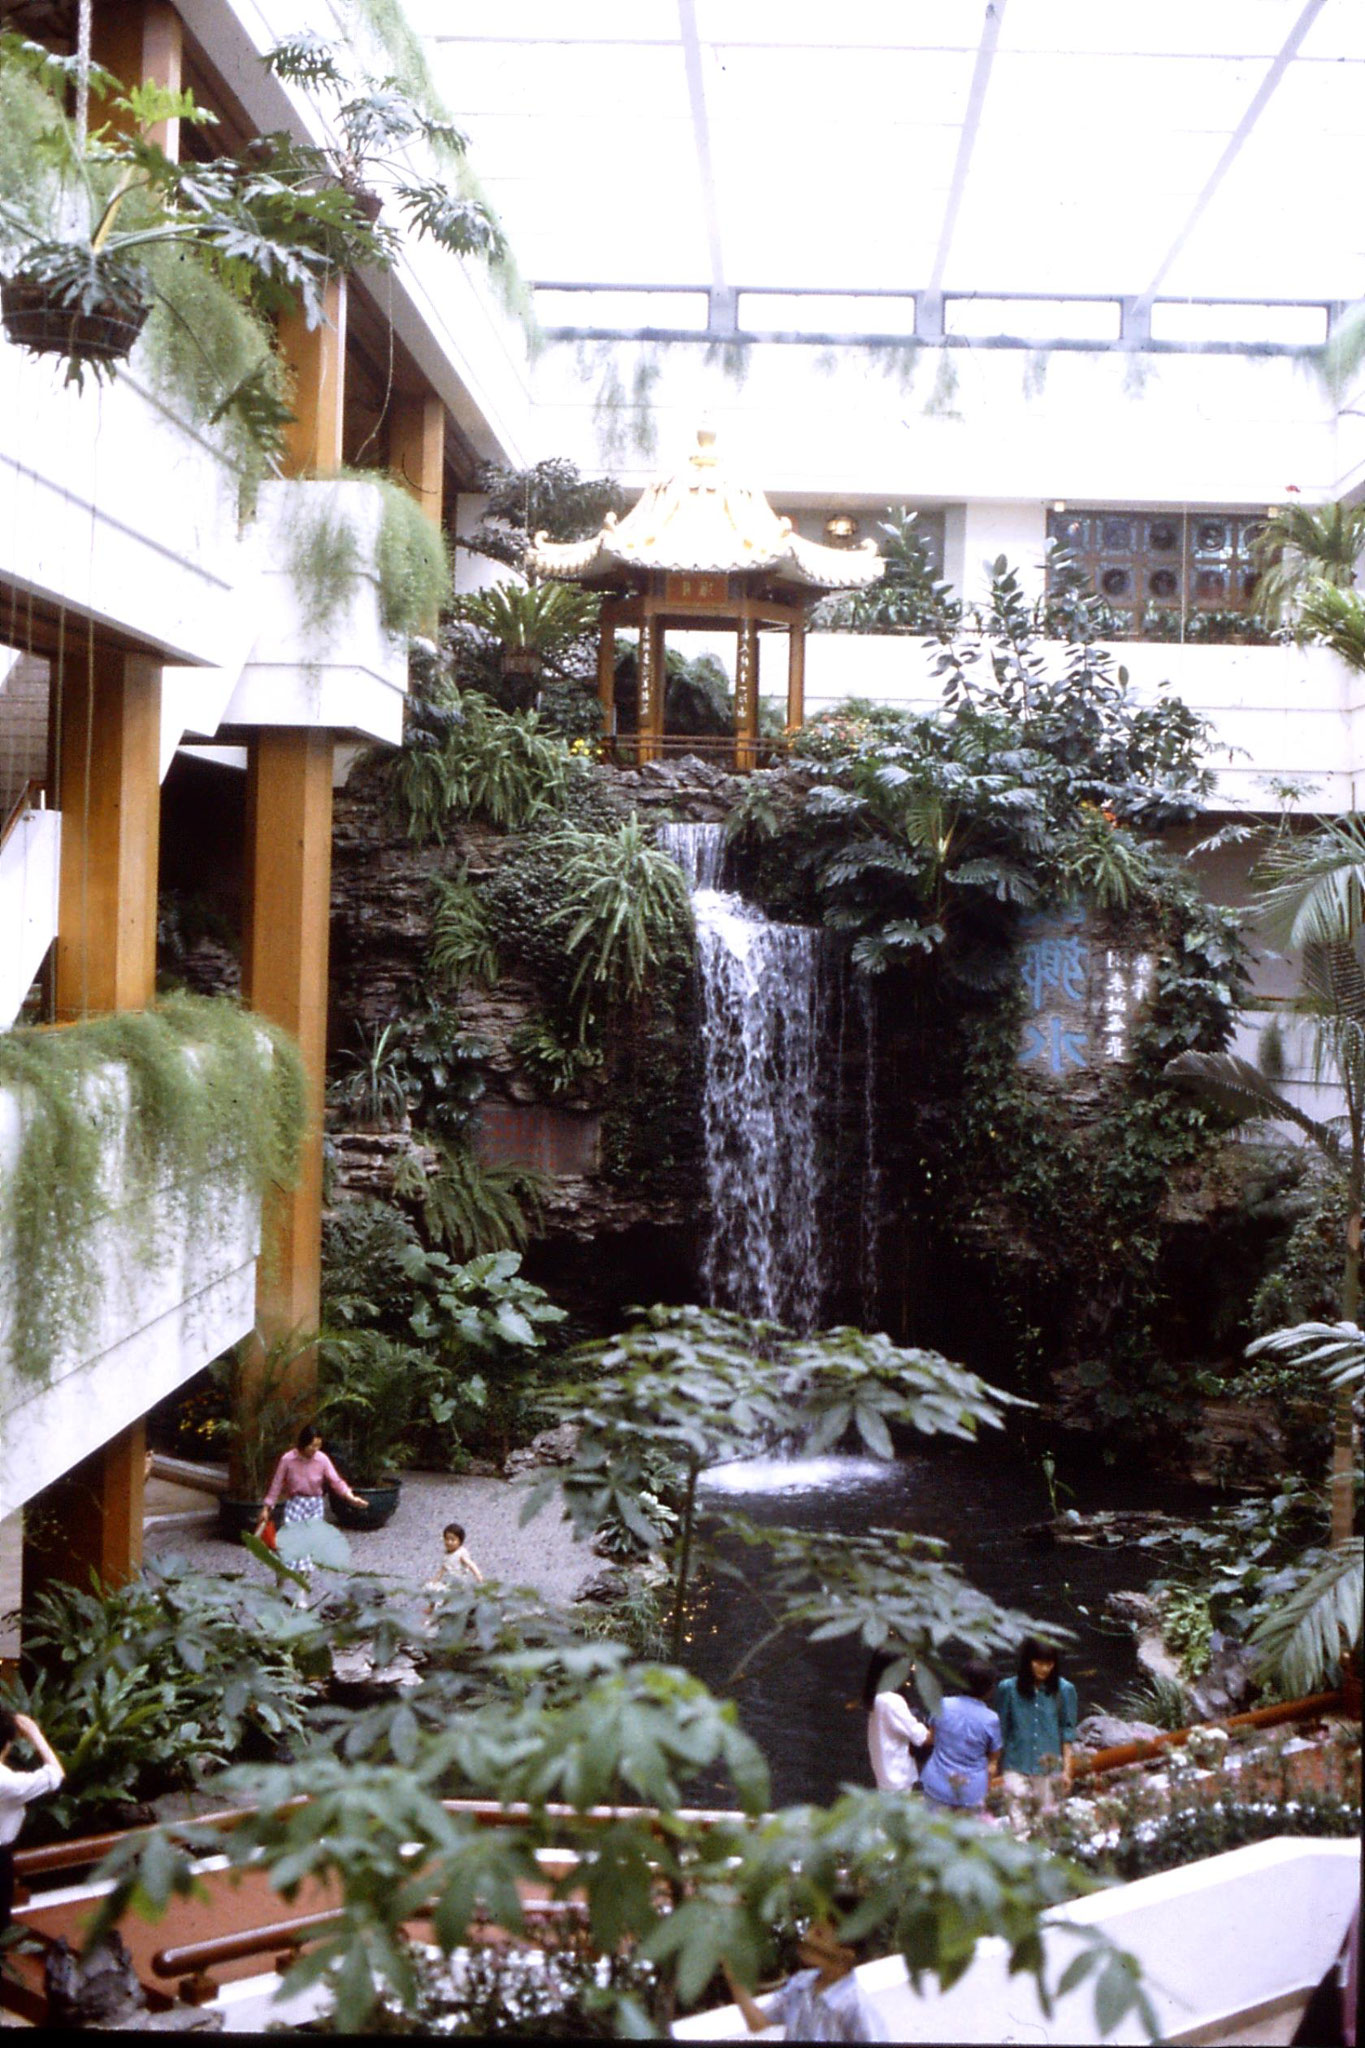 19/5/1989: 10: White Swan hotel